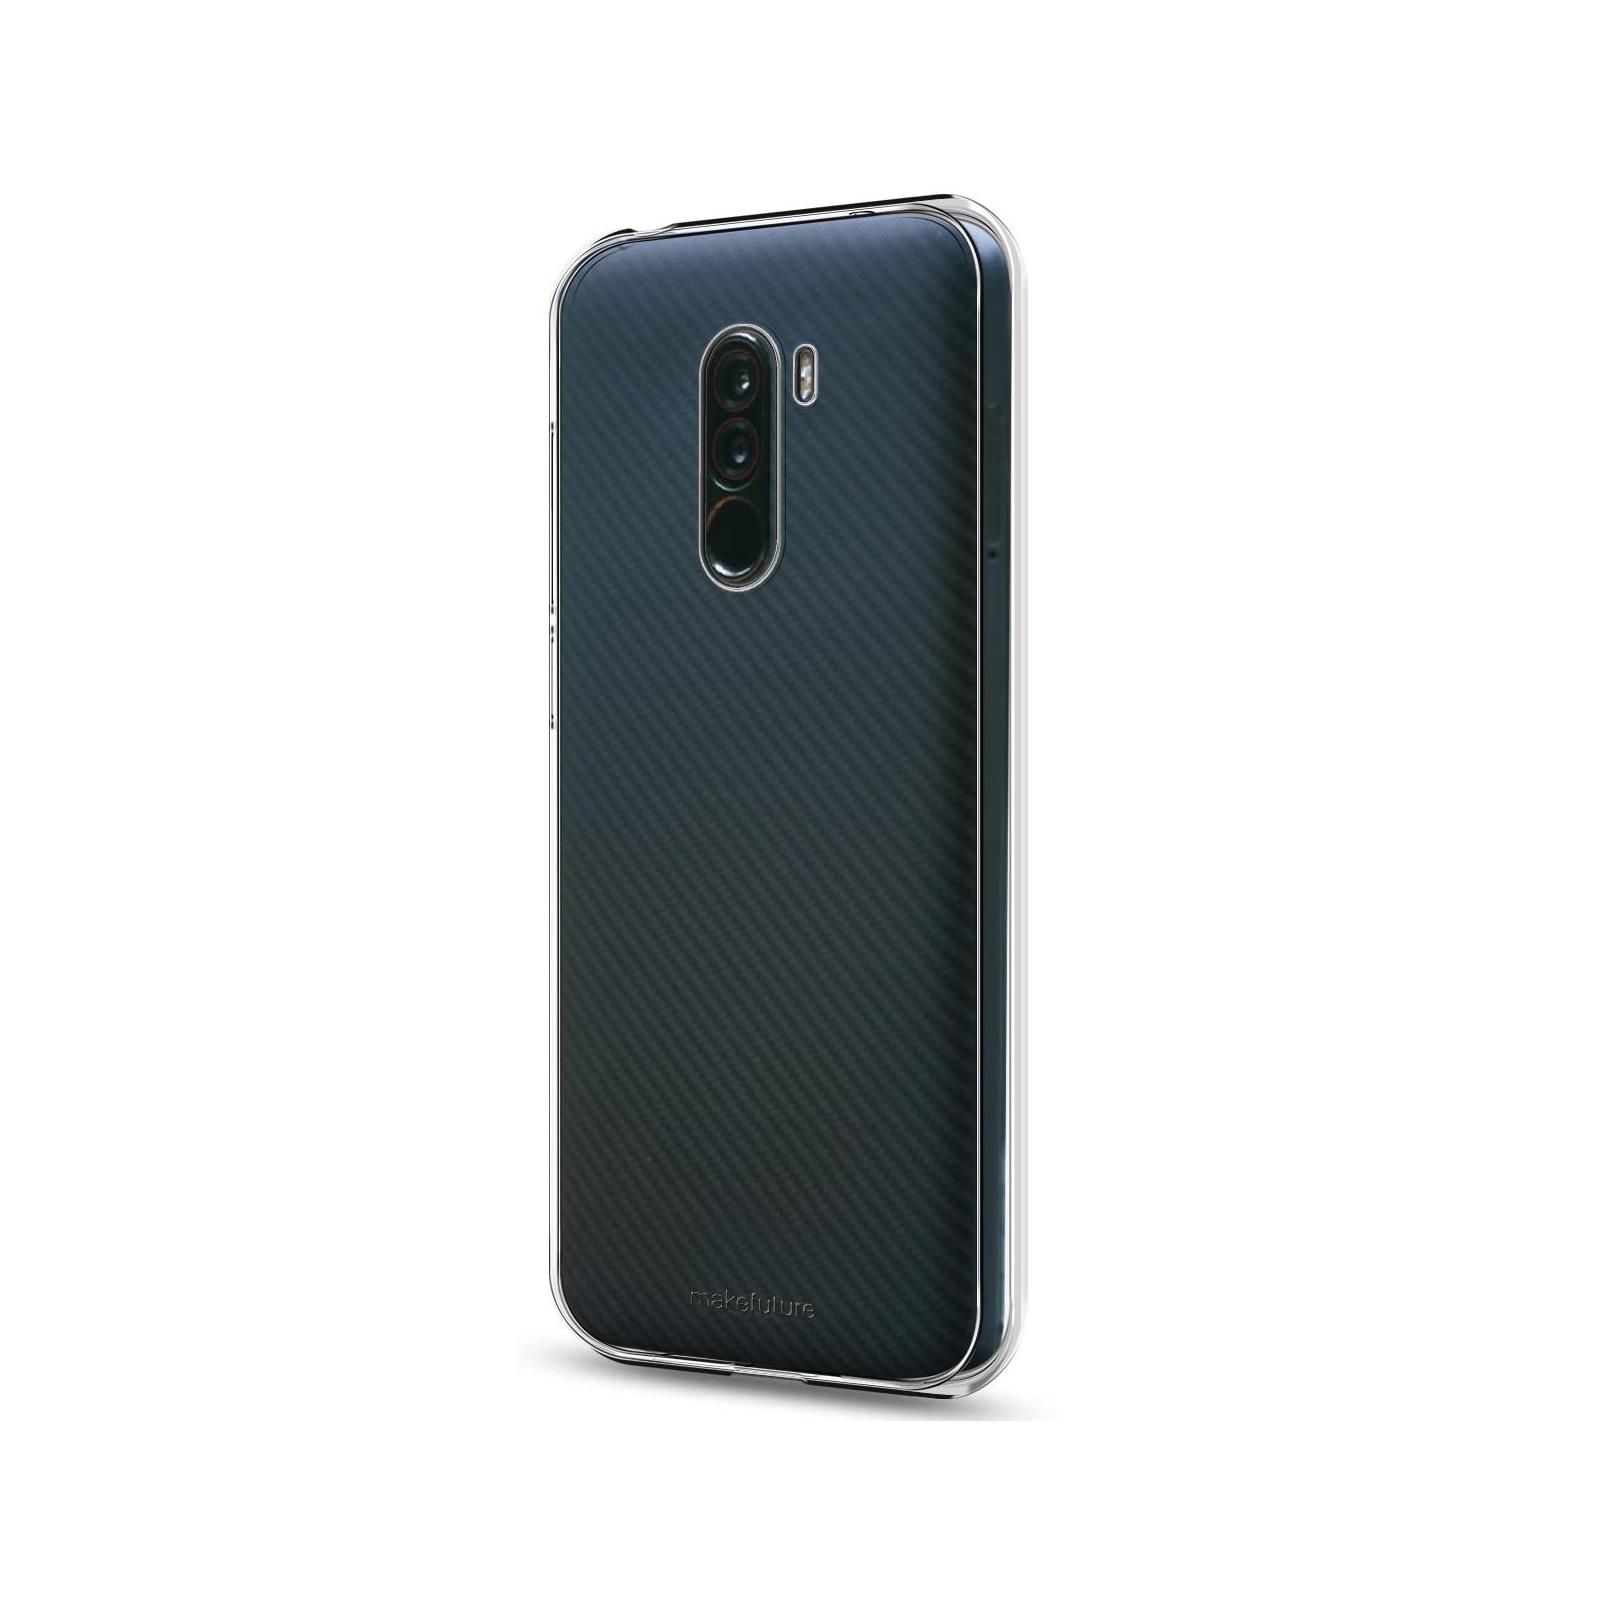 Чехол для моб. телефона MakeFuture Air Case (TPU) Xiaomi Pocophone F1 Clear (MCA-XPF1CL) изображение 2